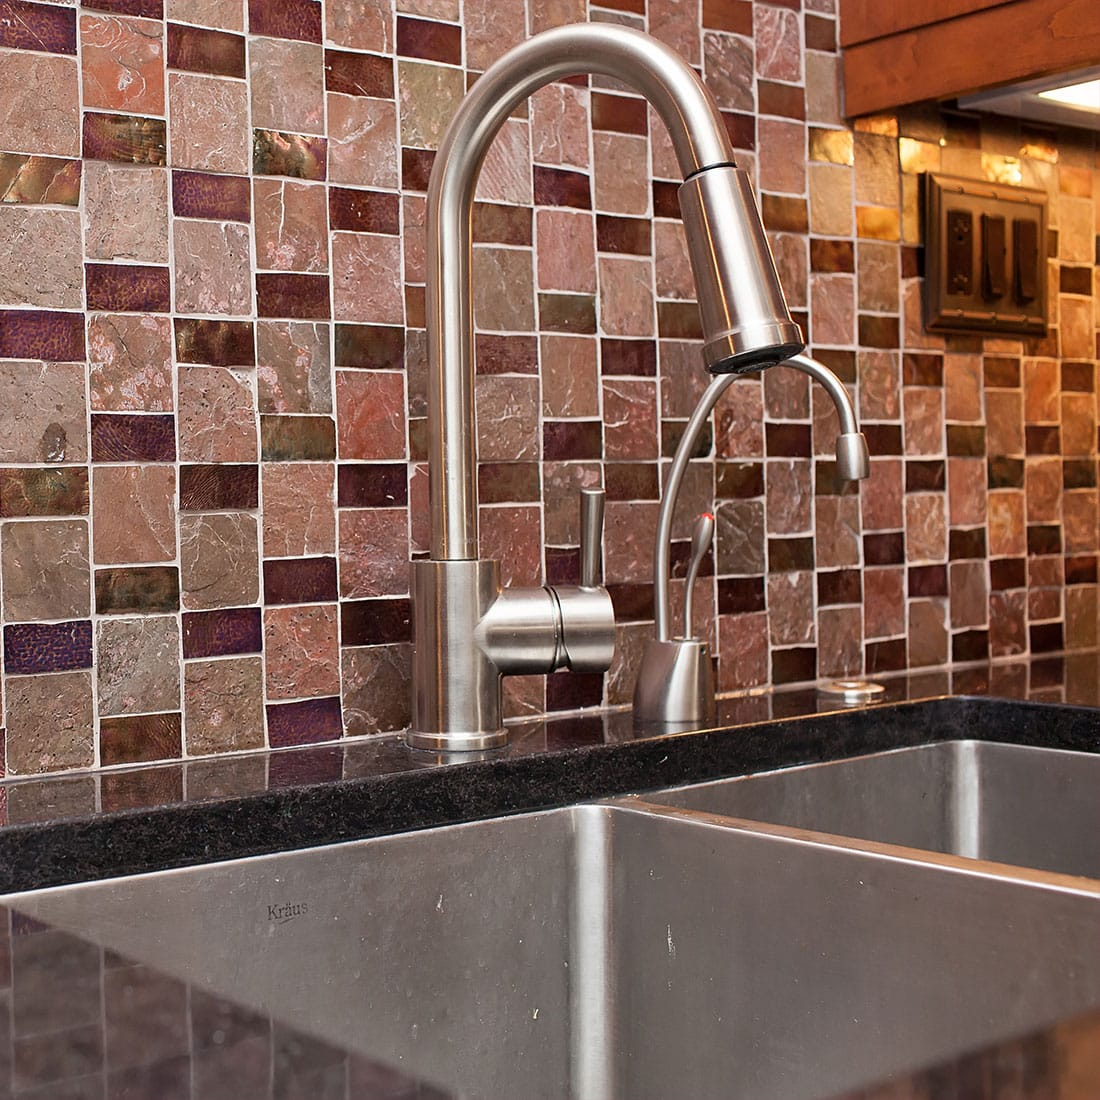 Custom maroon tile backsplash against black marble in renovated kitchen